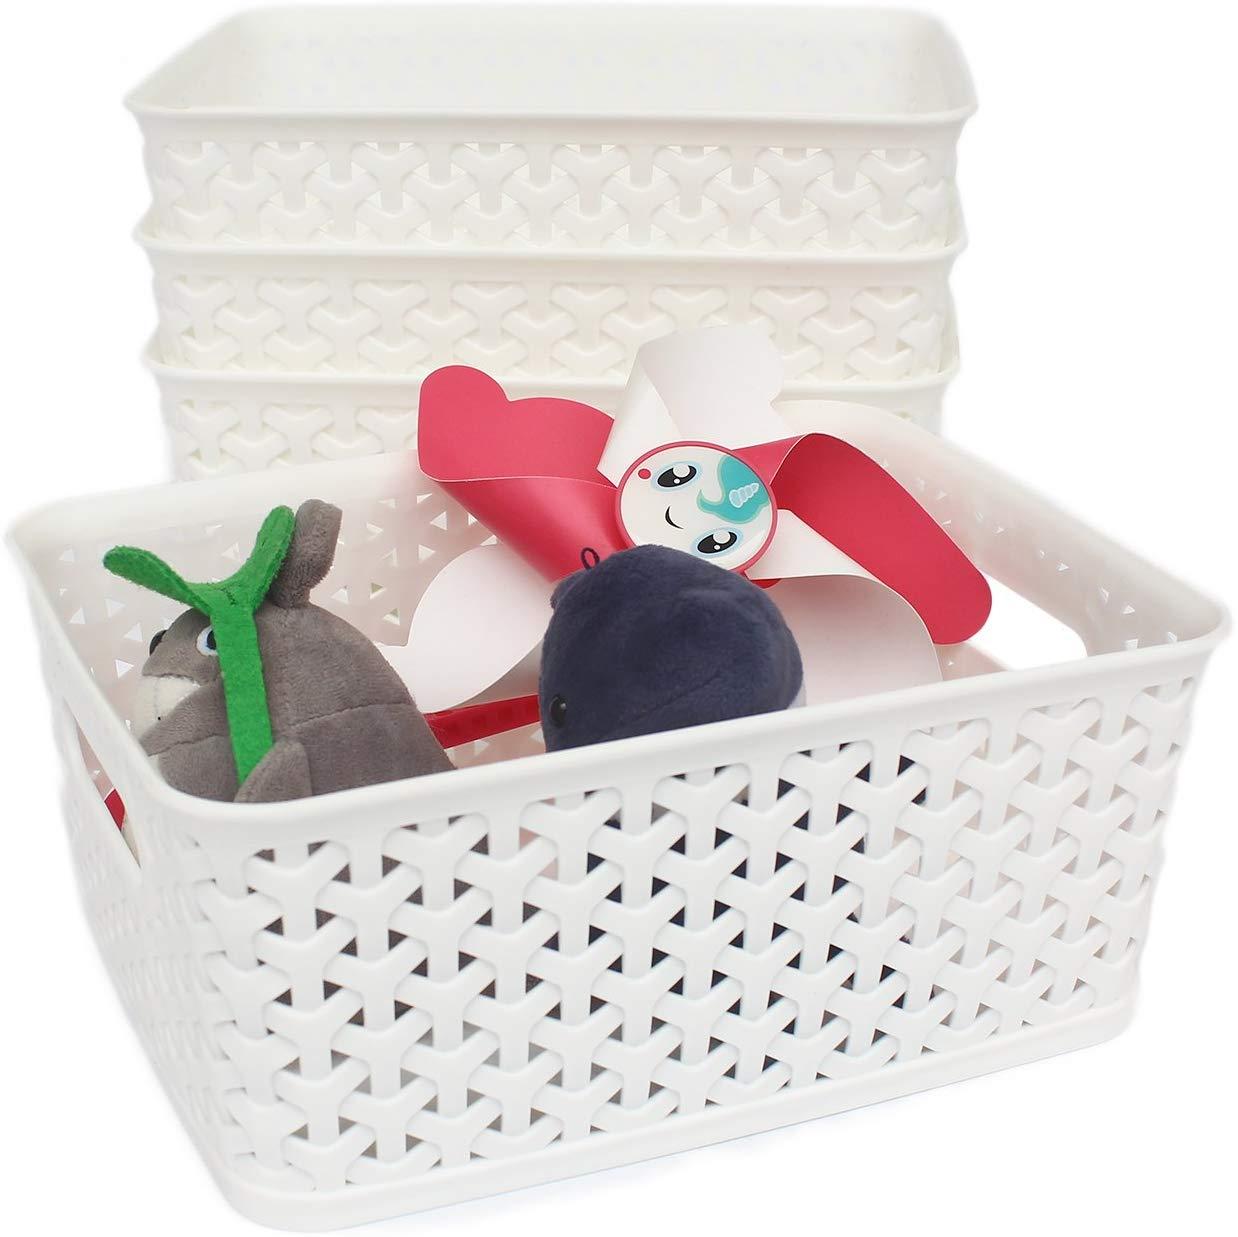 medium nickel over cabinet basket storables rh storables com over the cabinet basket bathroom over the cabinet storage basket